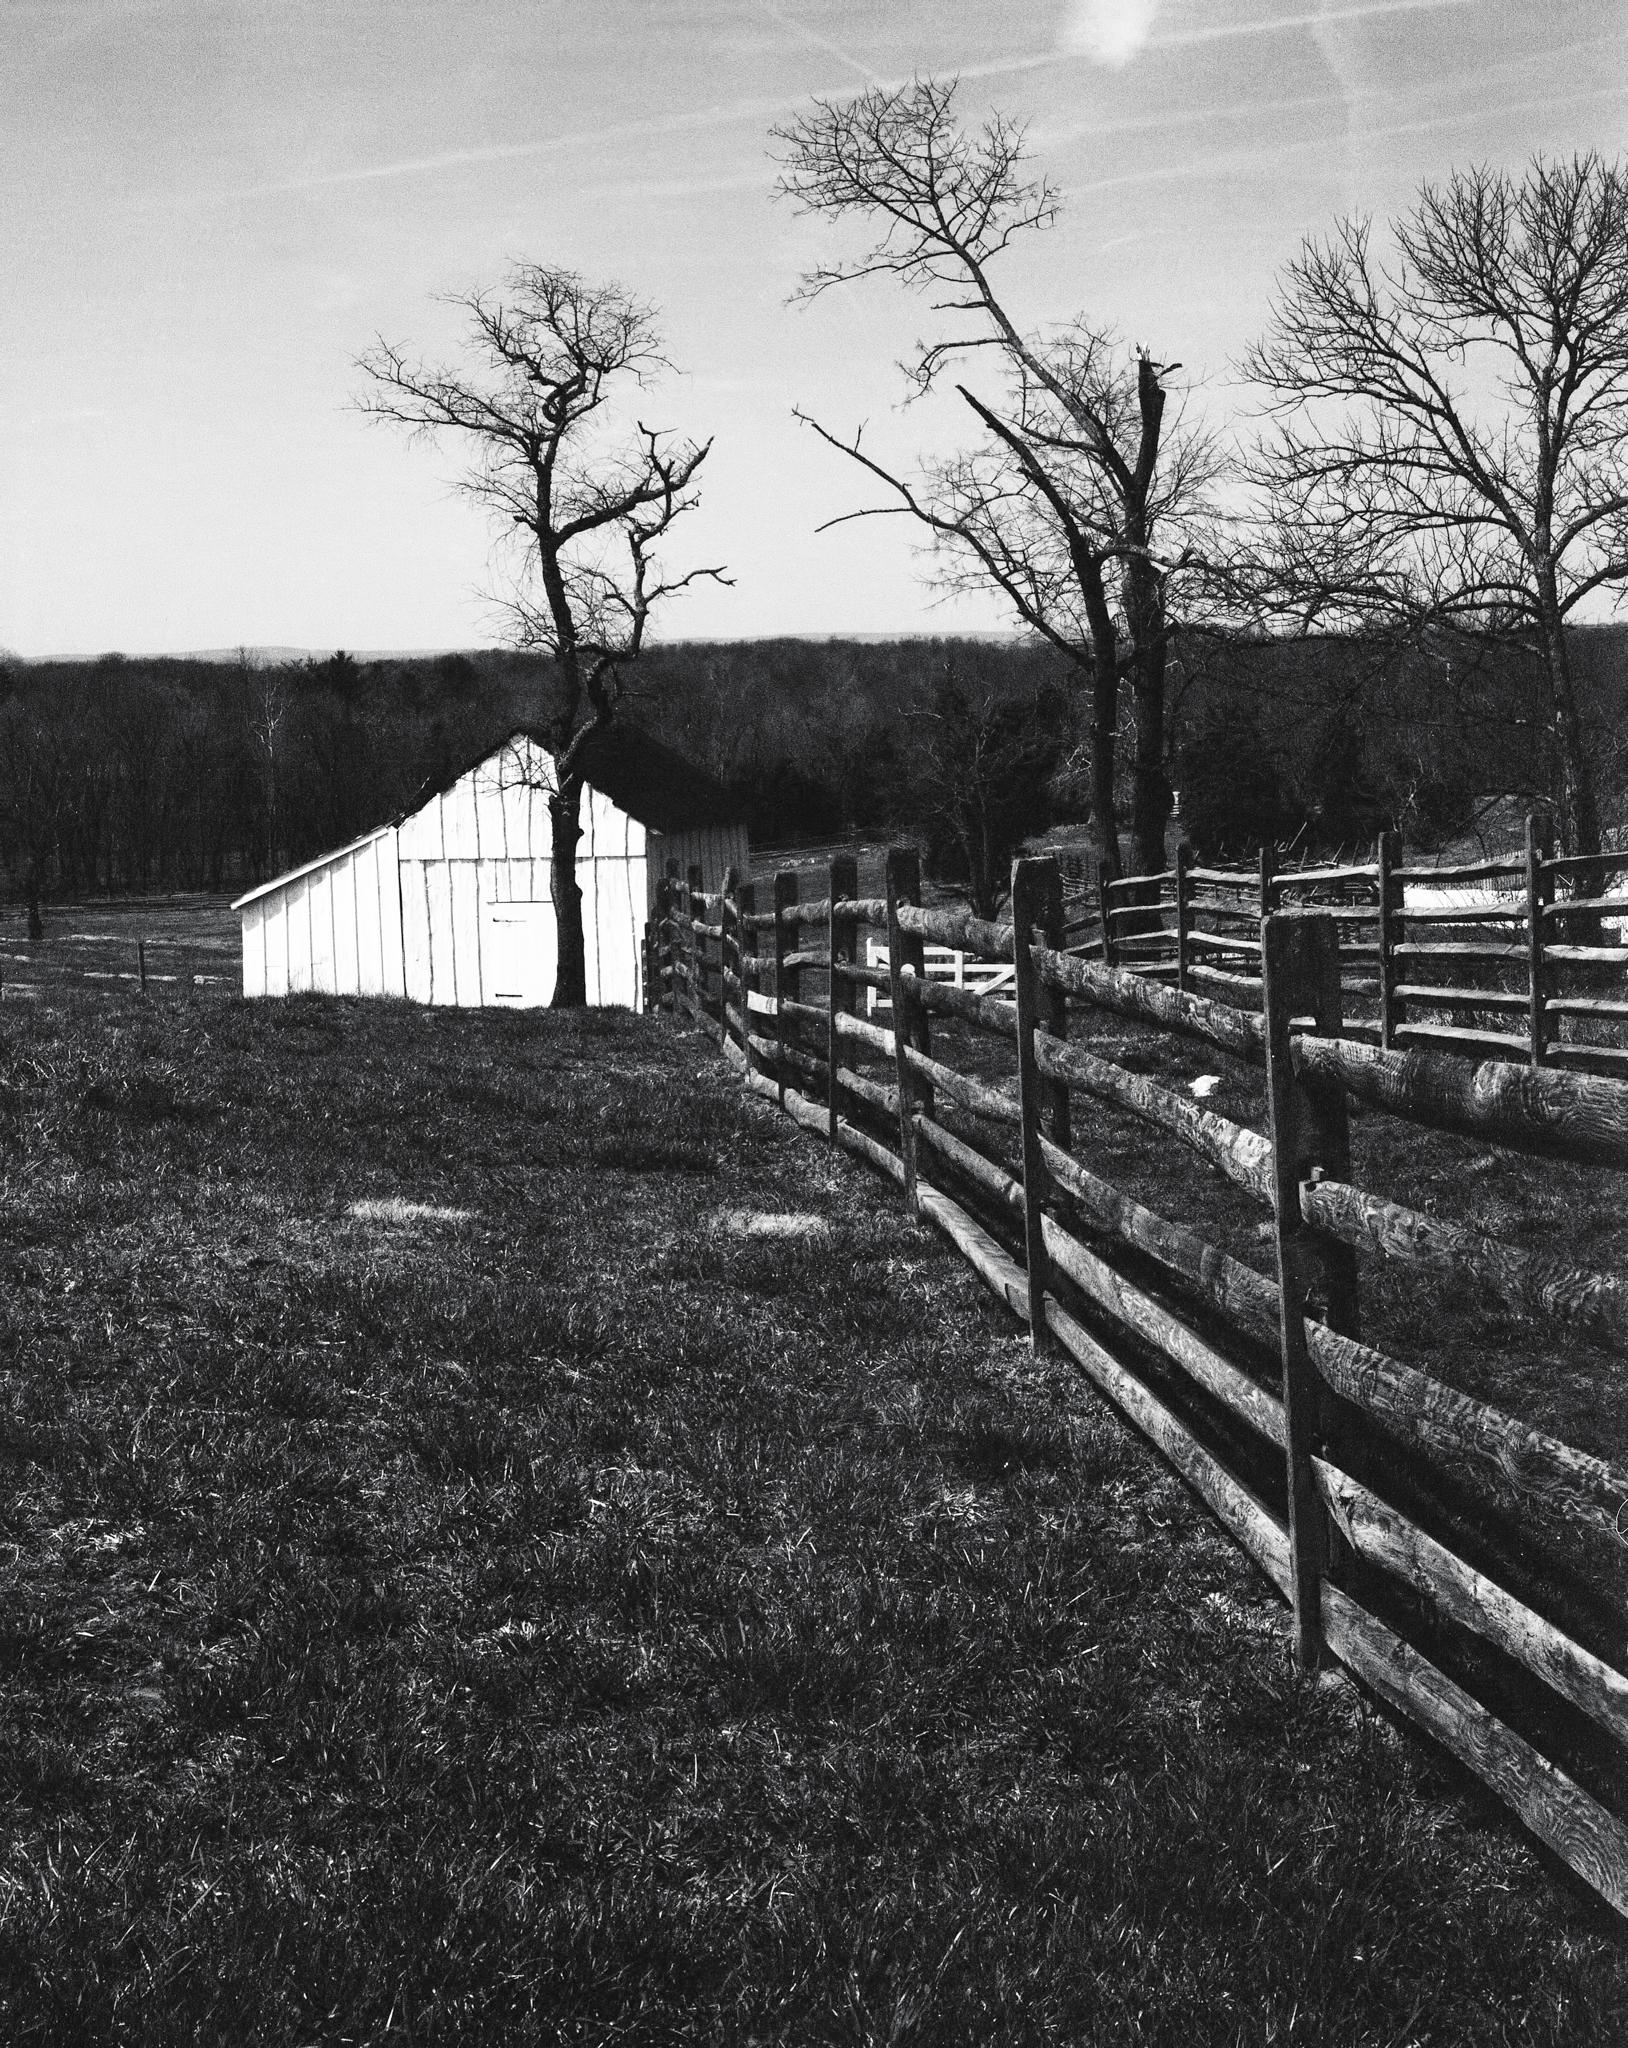 4x5_for_365_project_0104_Antietam_Battlefield_Poffenberger_Farm_Fencel.jpg